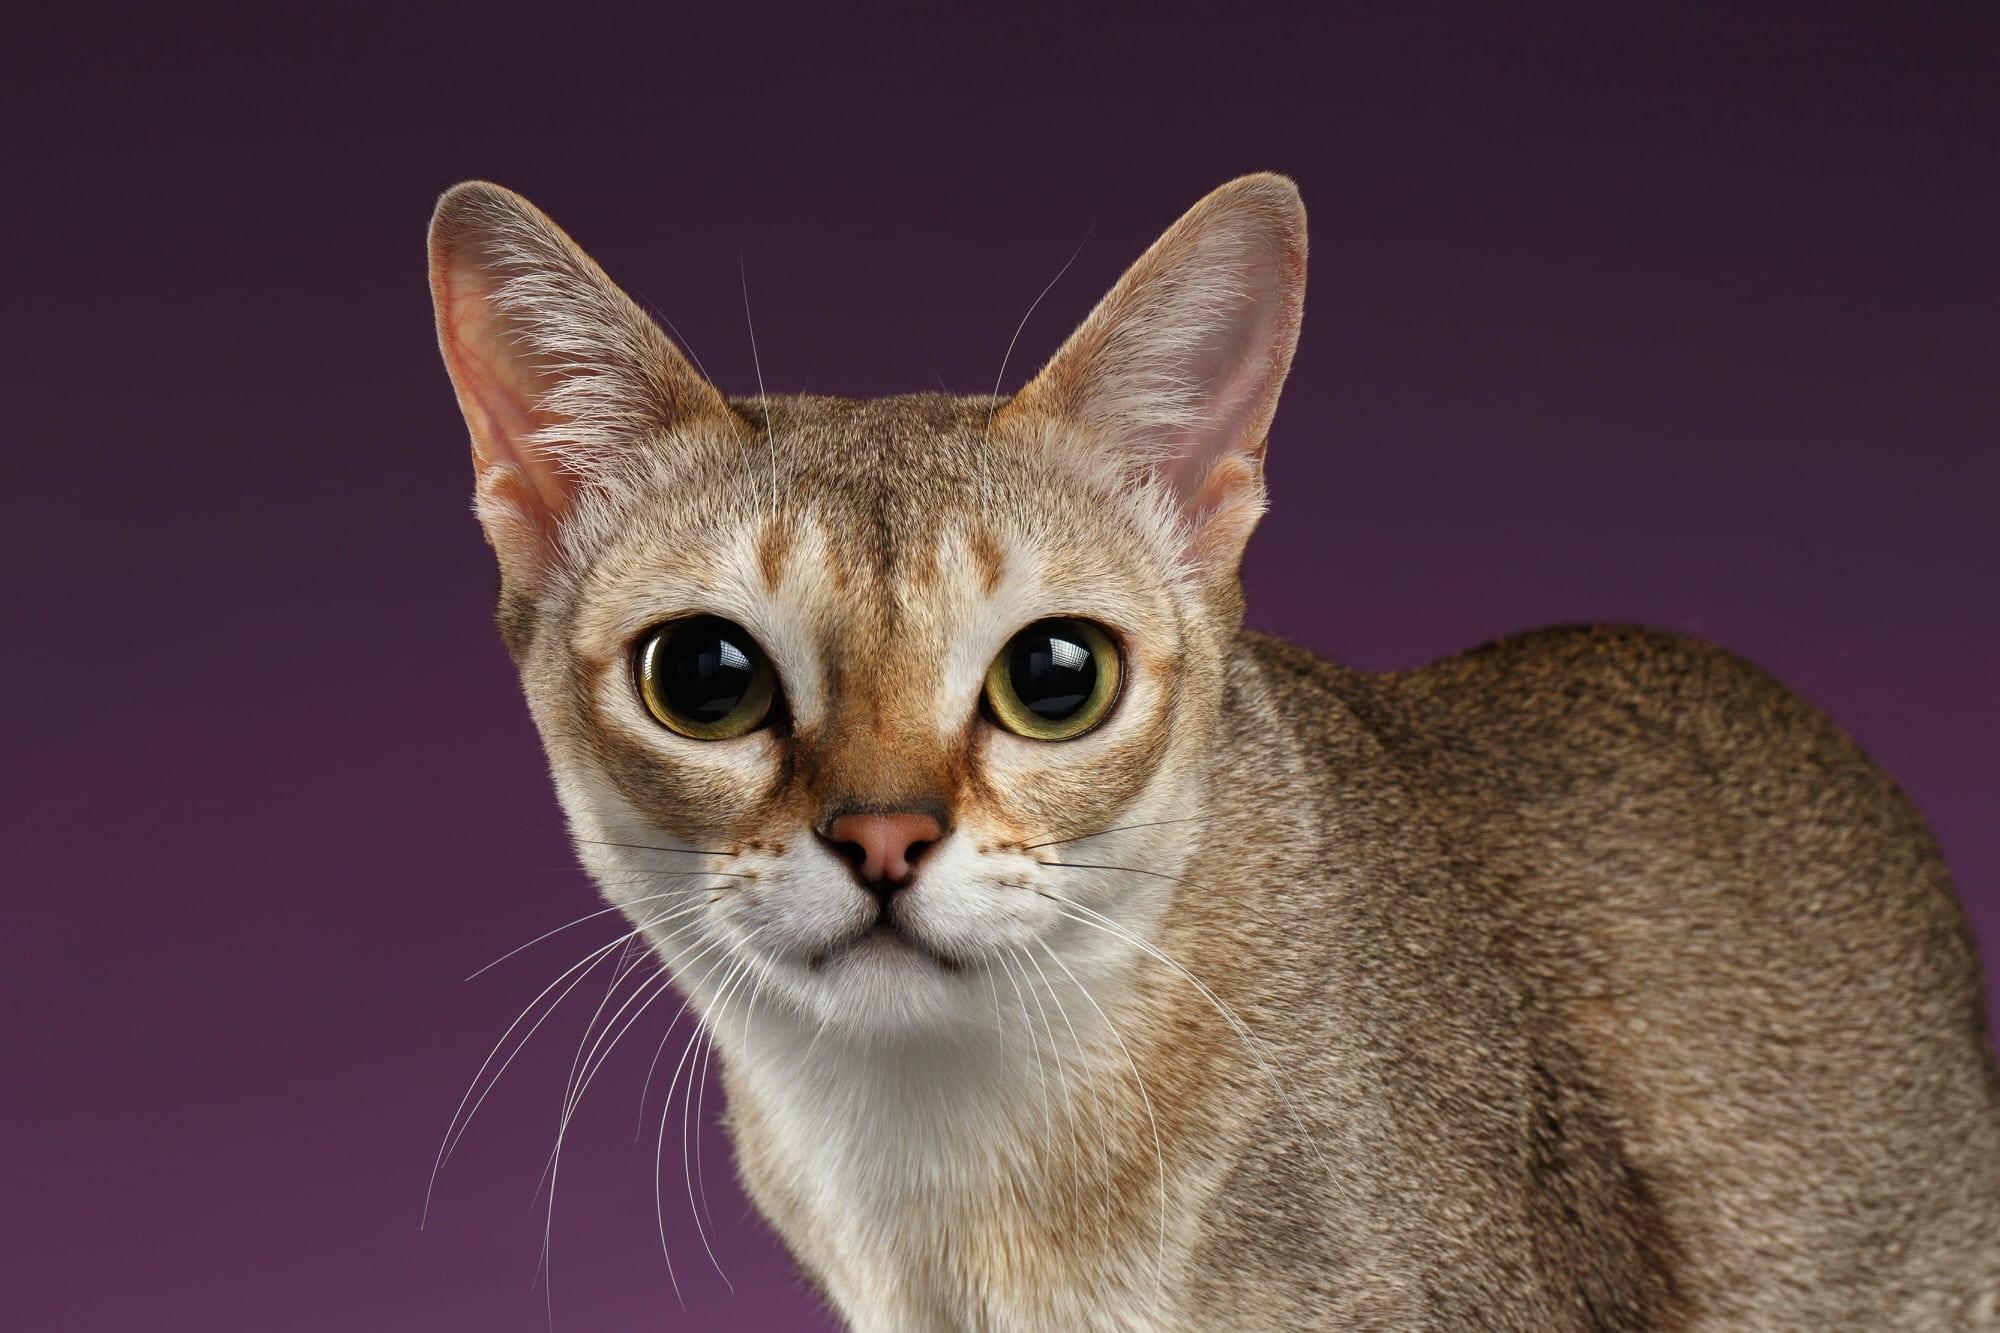 Ragamuffin Cat For Sale Malaysia